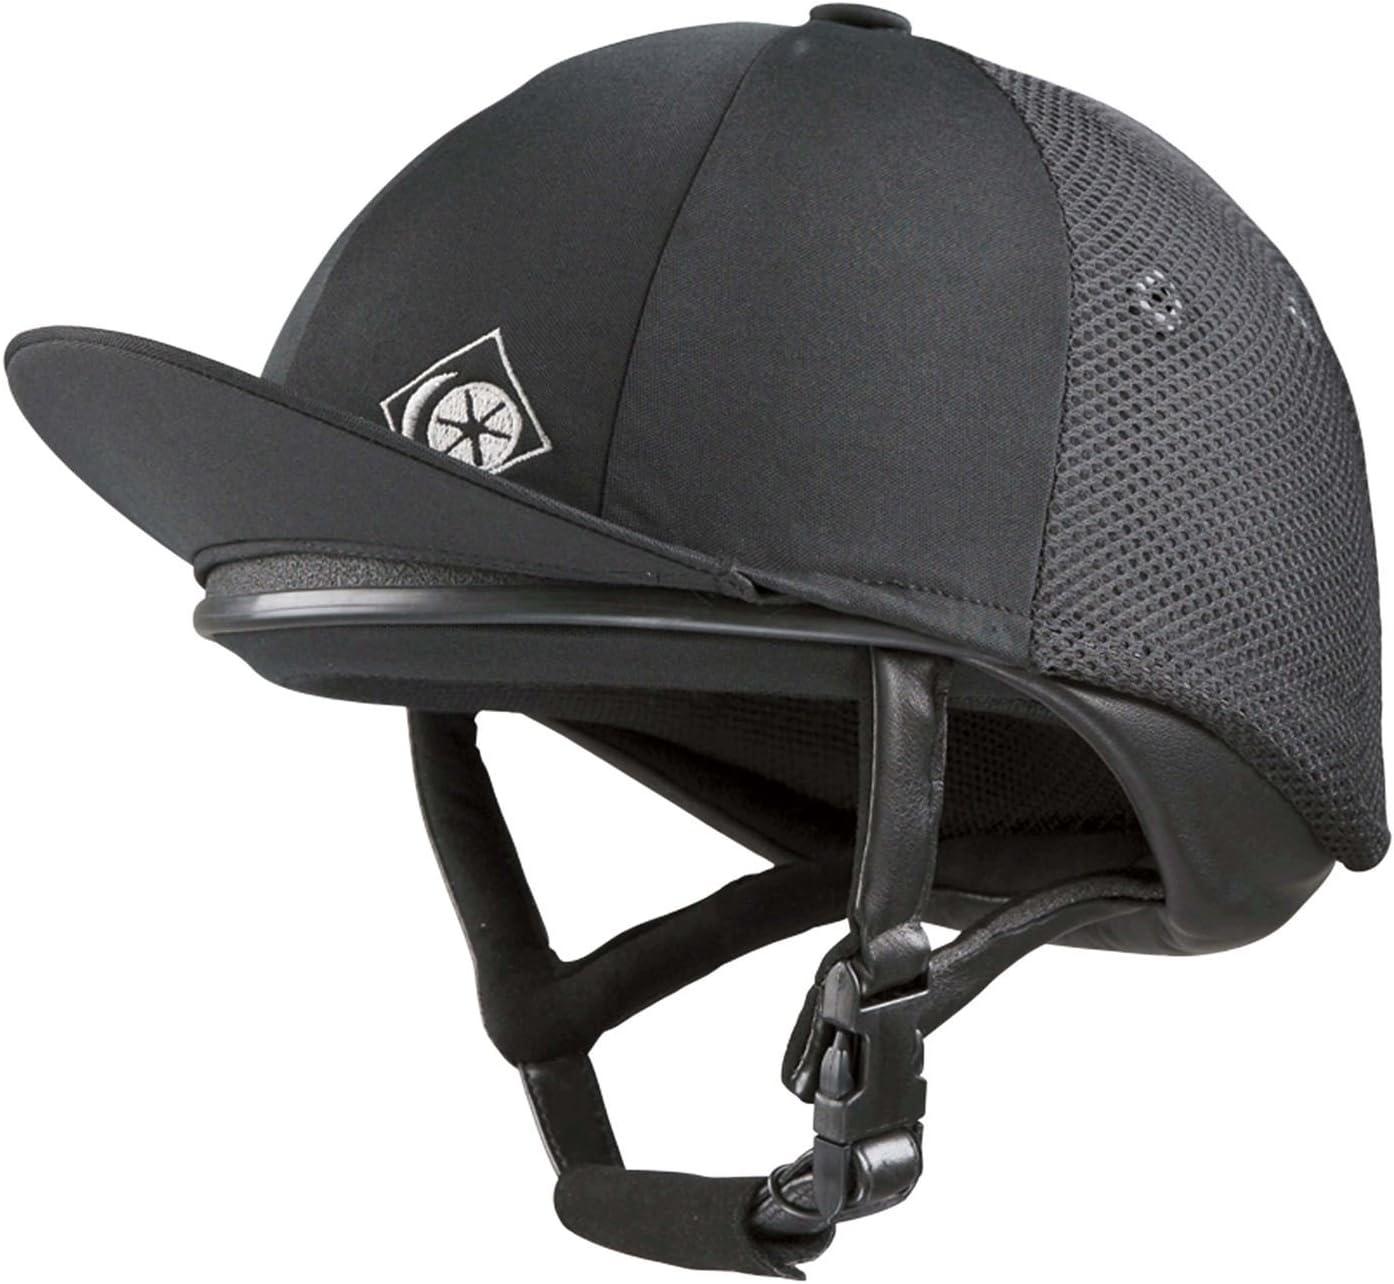 Charles Owen Pro II horse riding skull hat helmet low profile vented pro 2